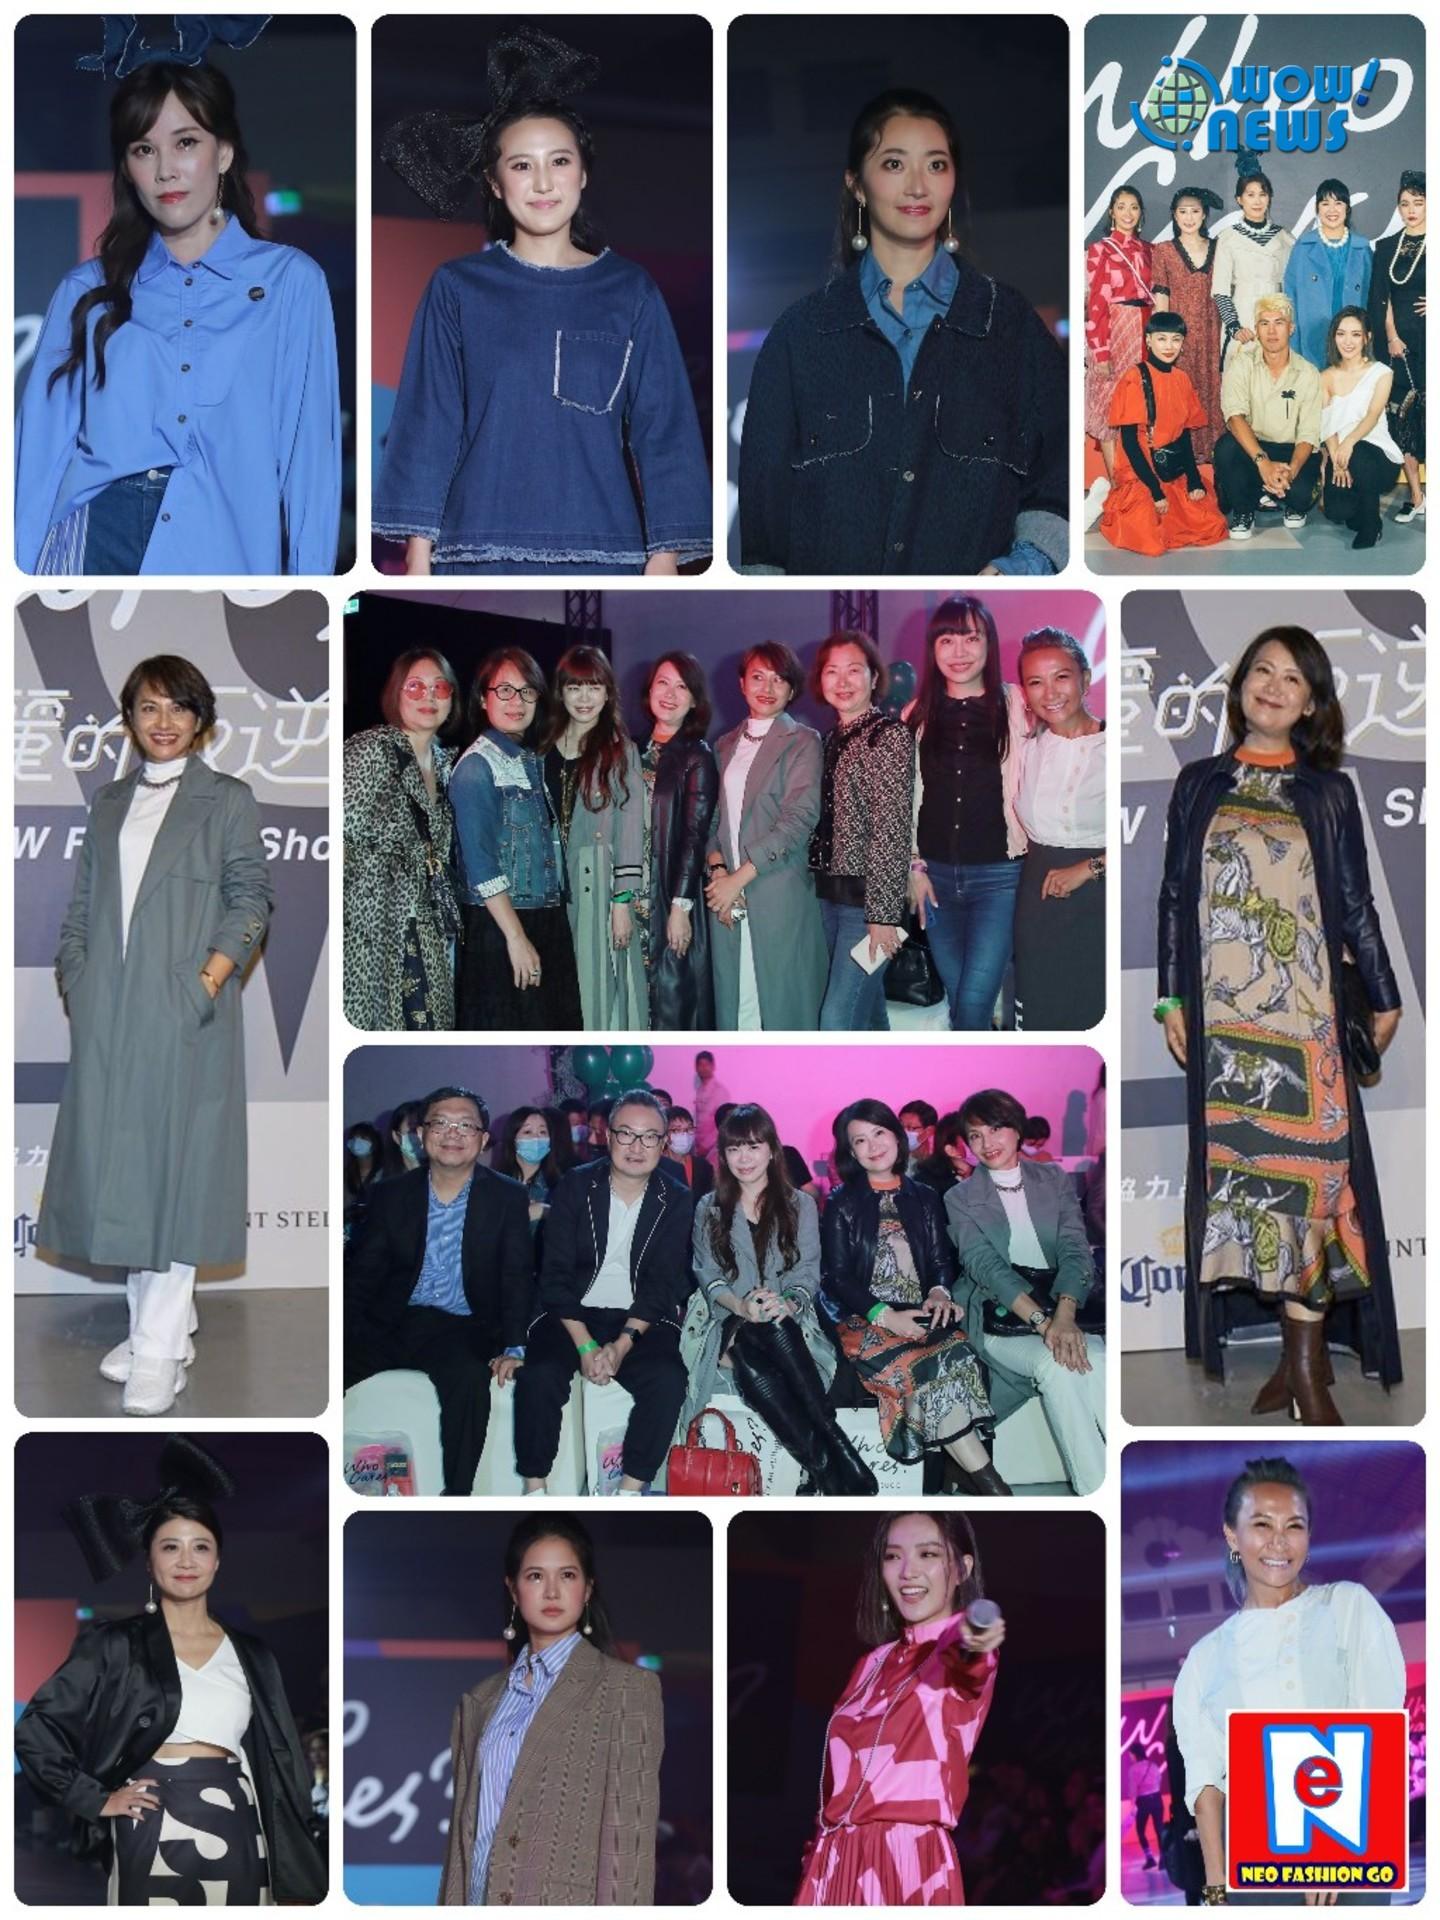 2020「Who Cares 年度大秀-華麗的叛逆」林楚茵、林亮君、耿葳、劉珈君等16位女力新超模 展現非凡魅力